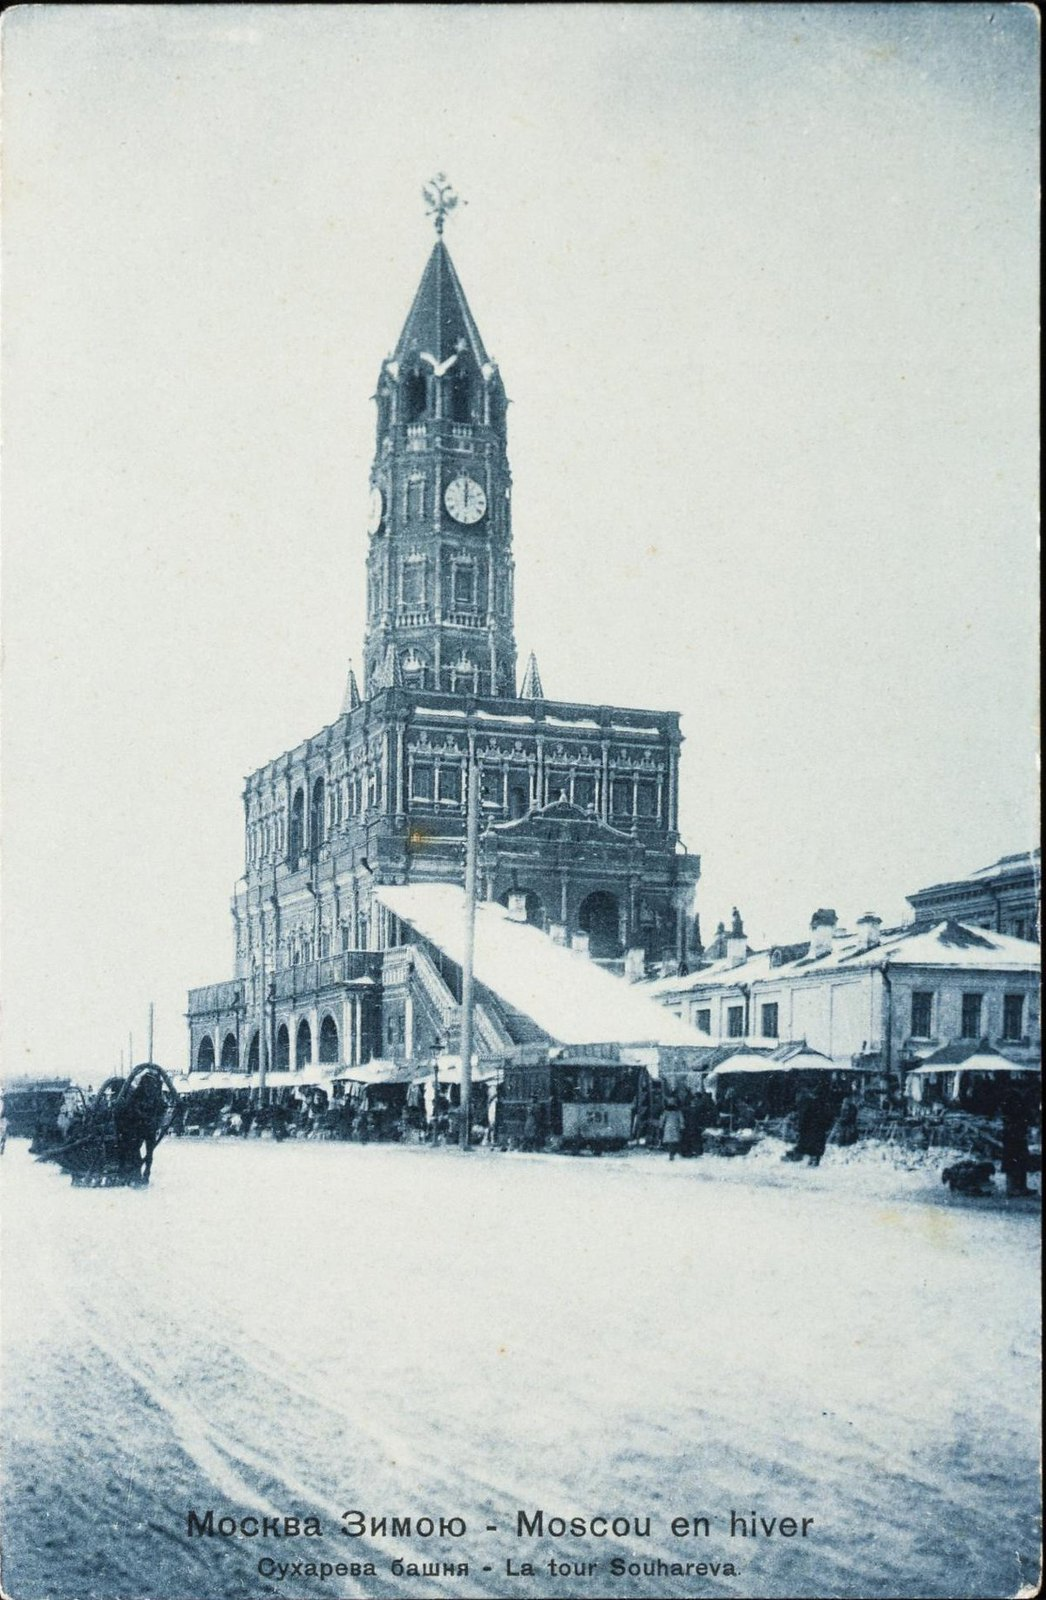 Москва зимой. Сухарева башня